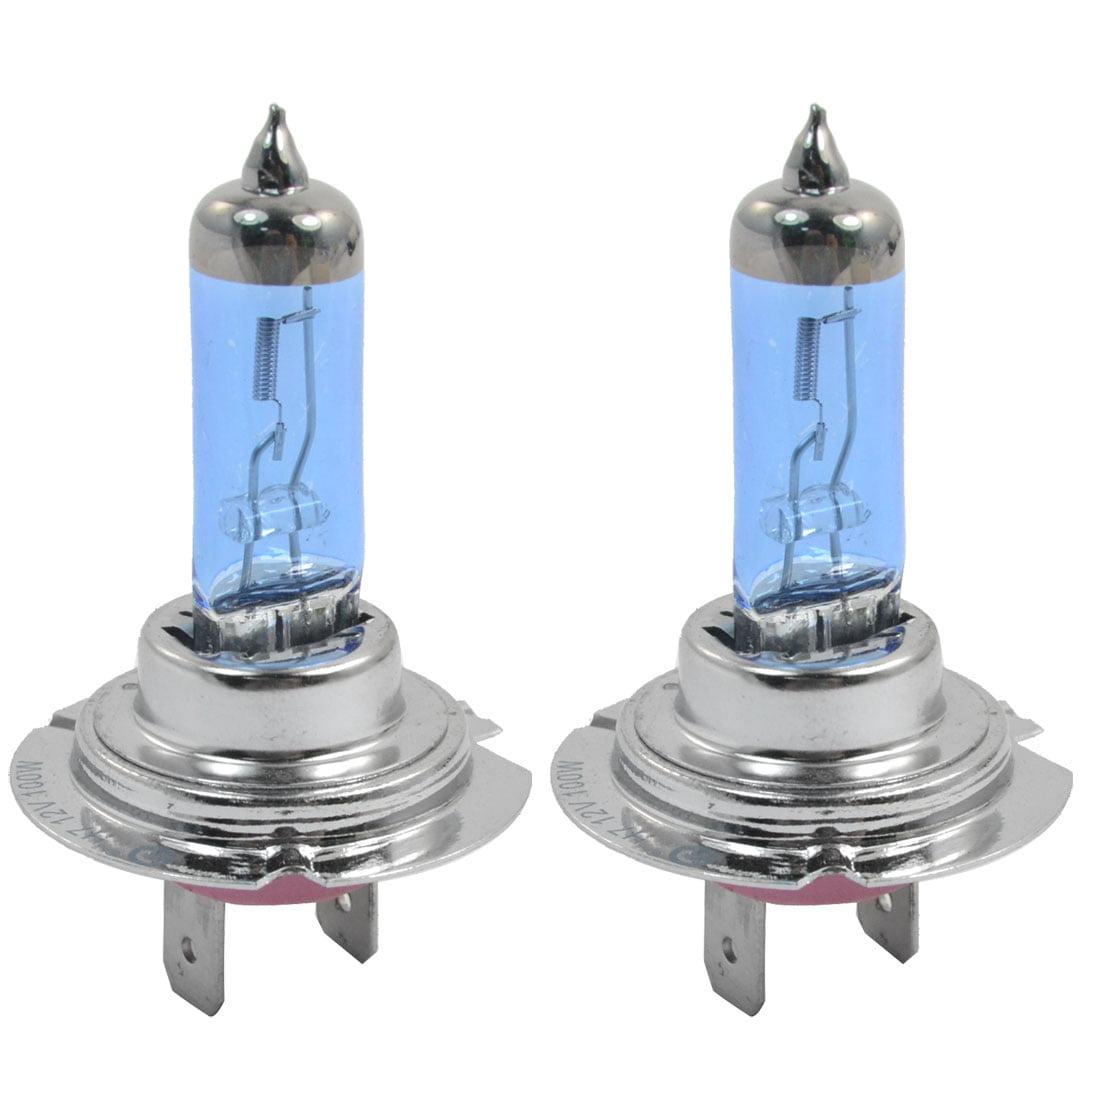 12V 100W White H7 Halogen Auto Truck Headlight Lamp Daytime Bulb 2 Pcs